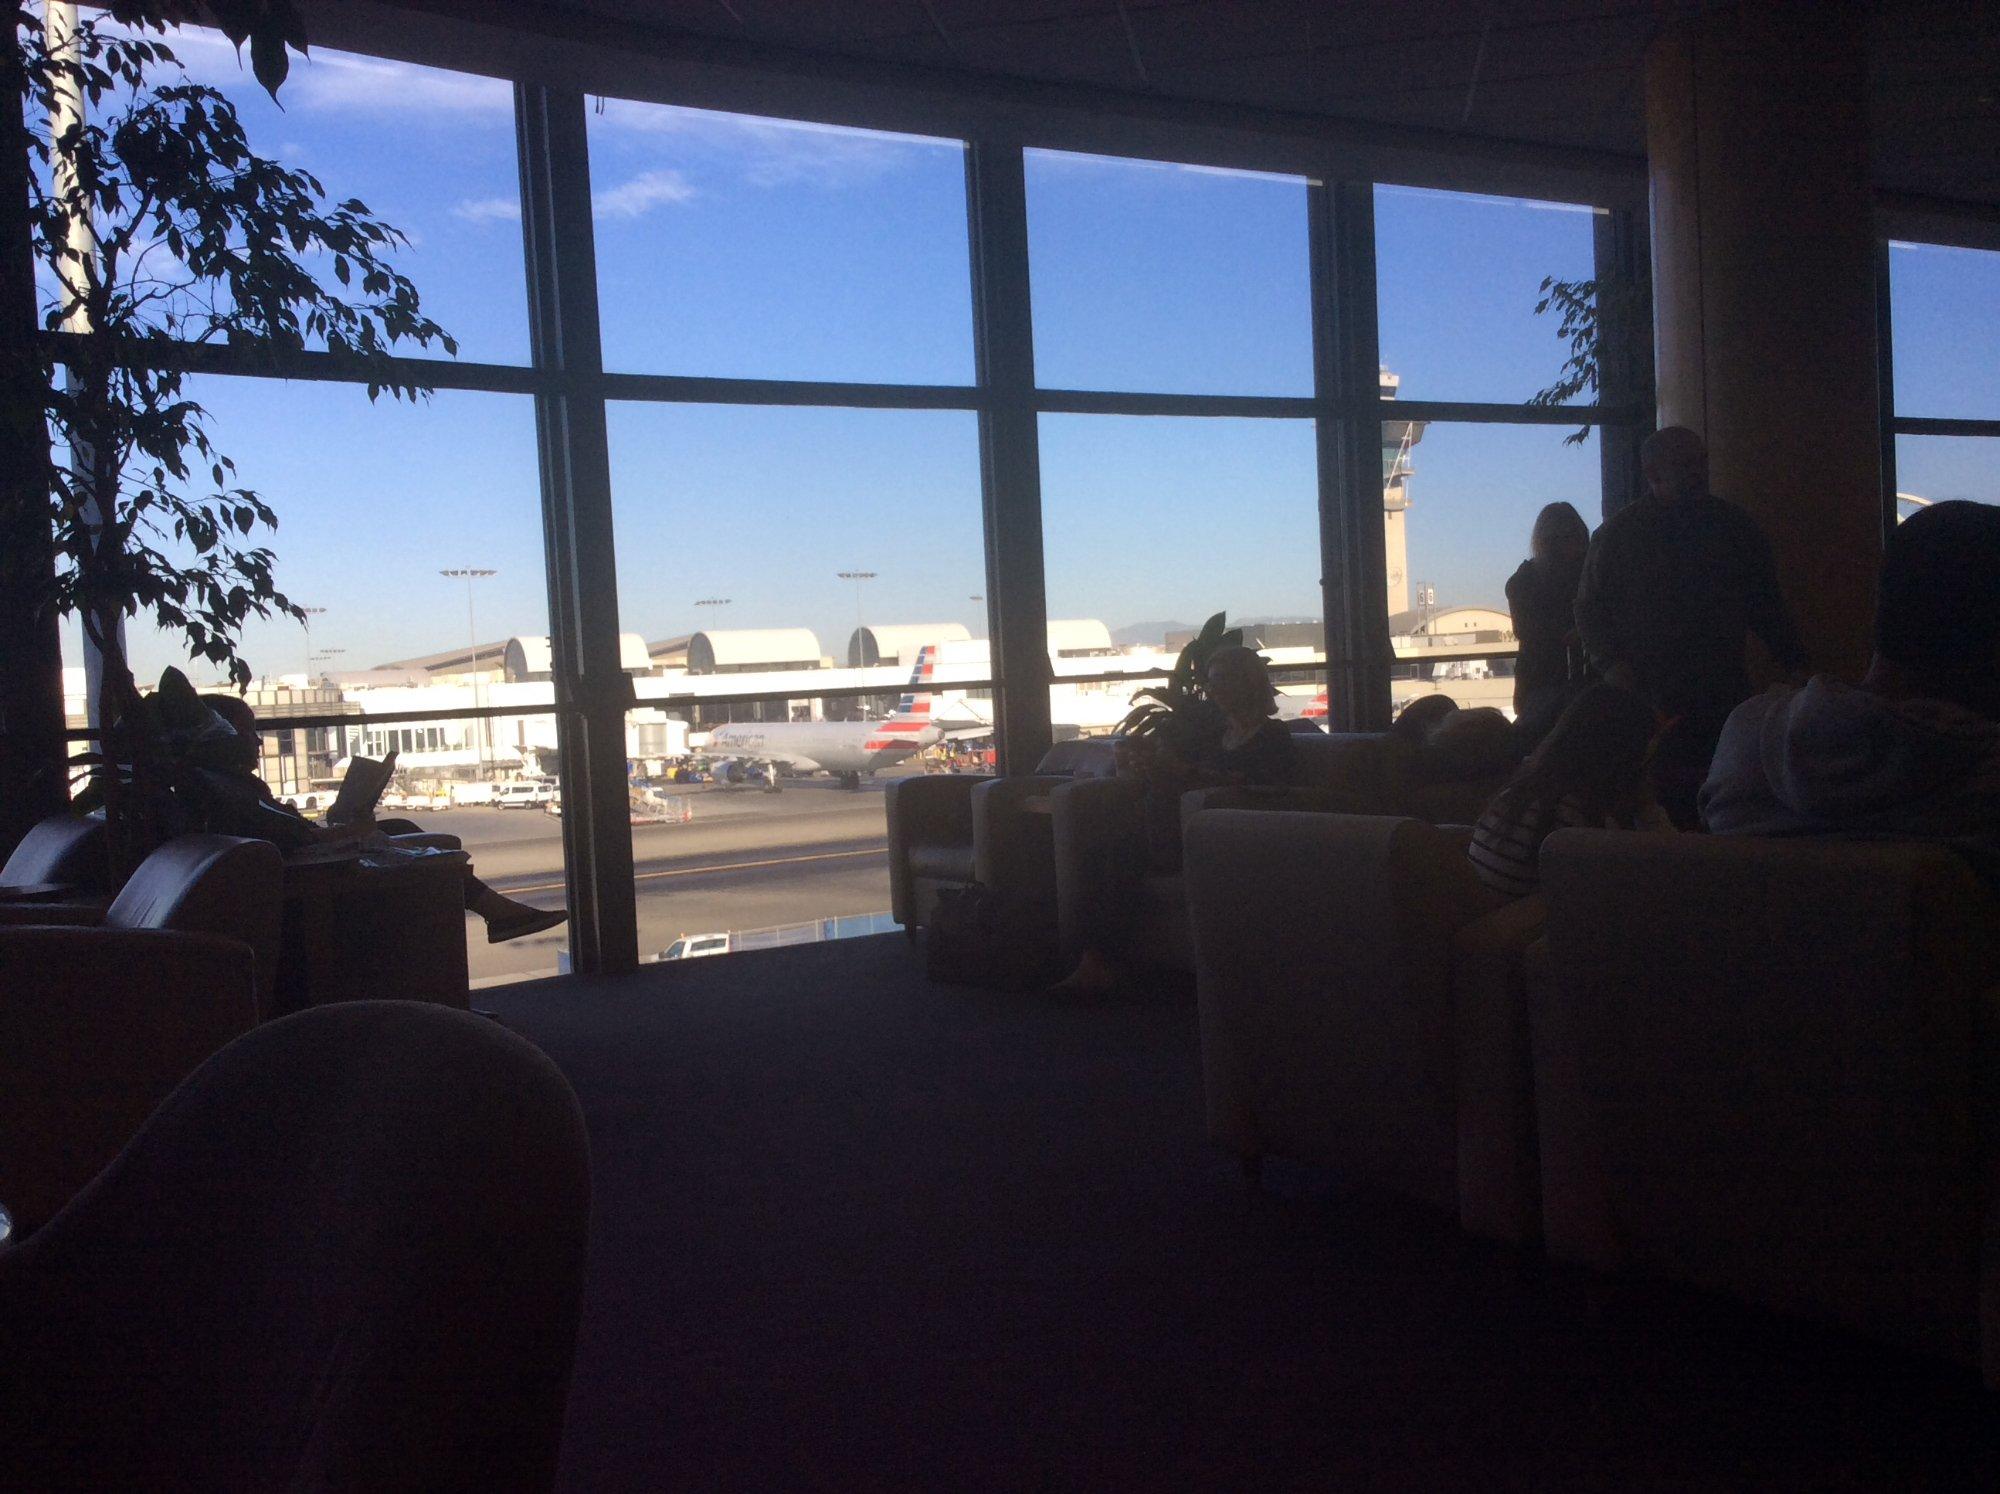 United Club terminal 7 Aeopuerto Internacional LAX